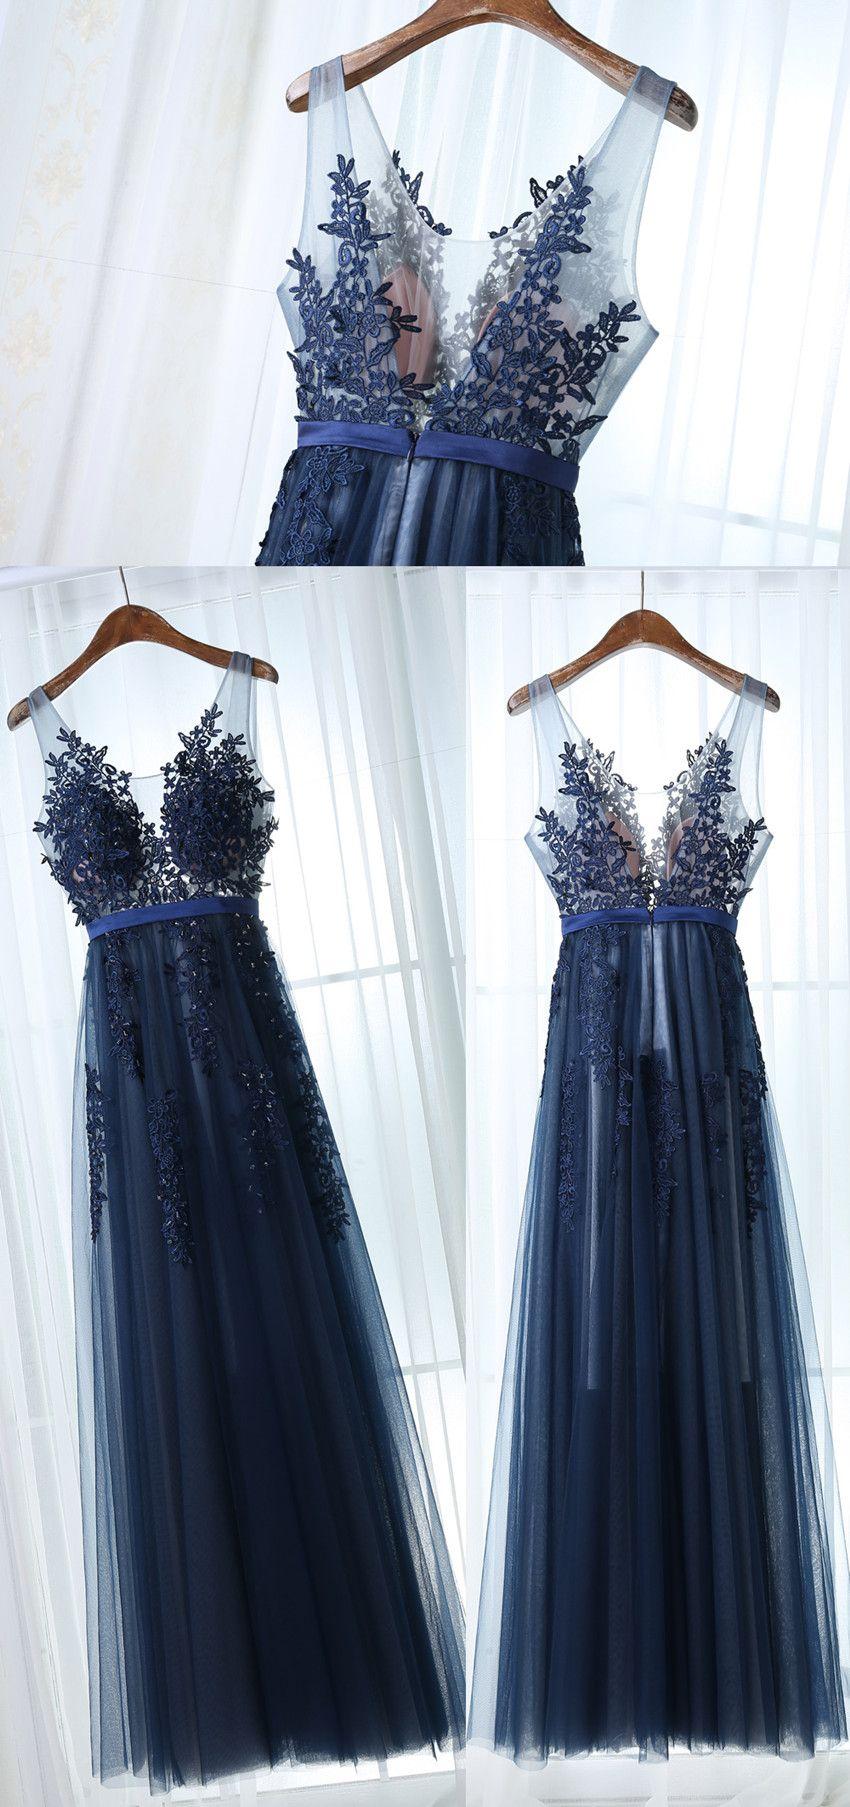 Simple a line sleeveless dark navy prom dressapplique long prom